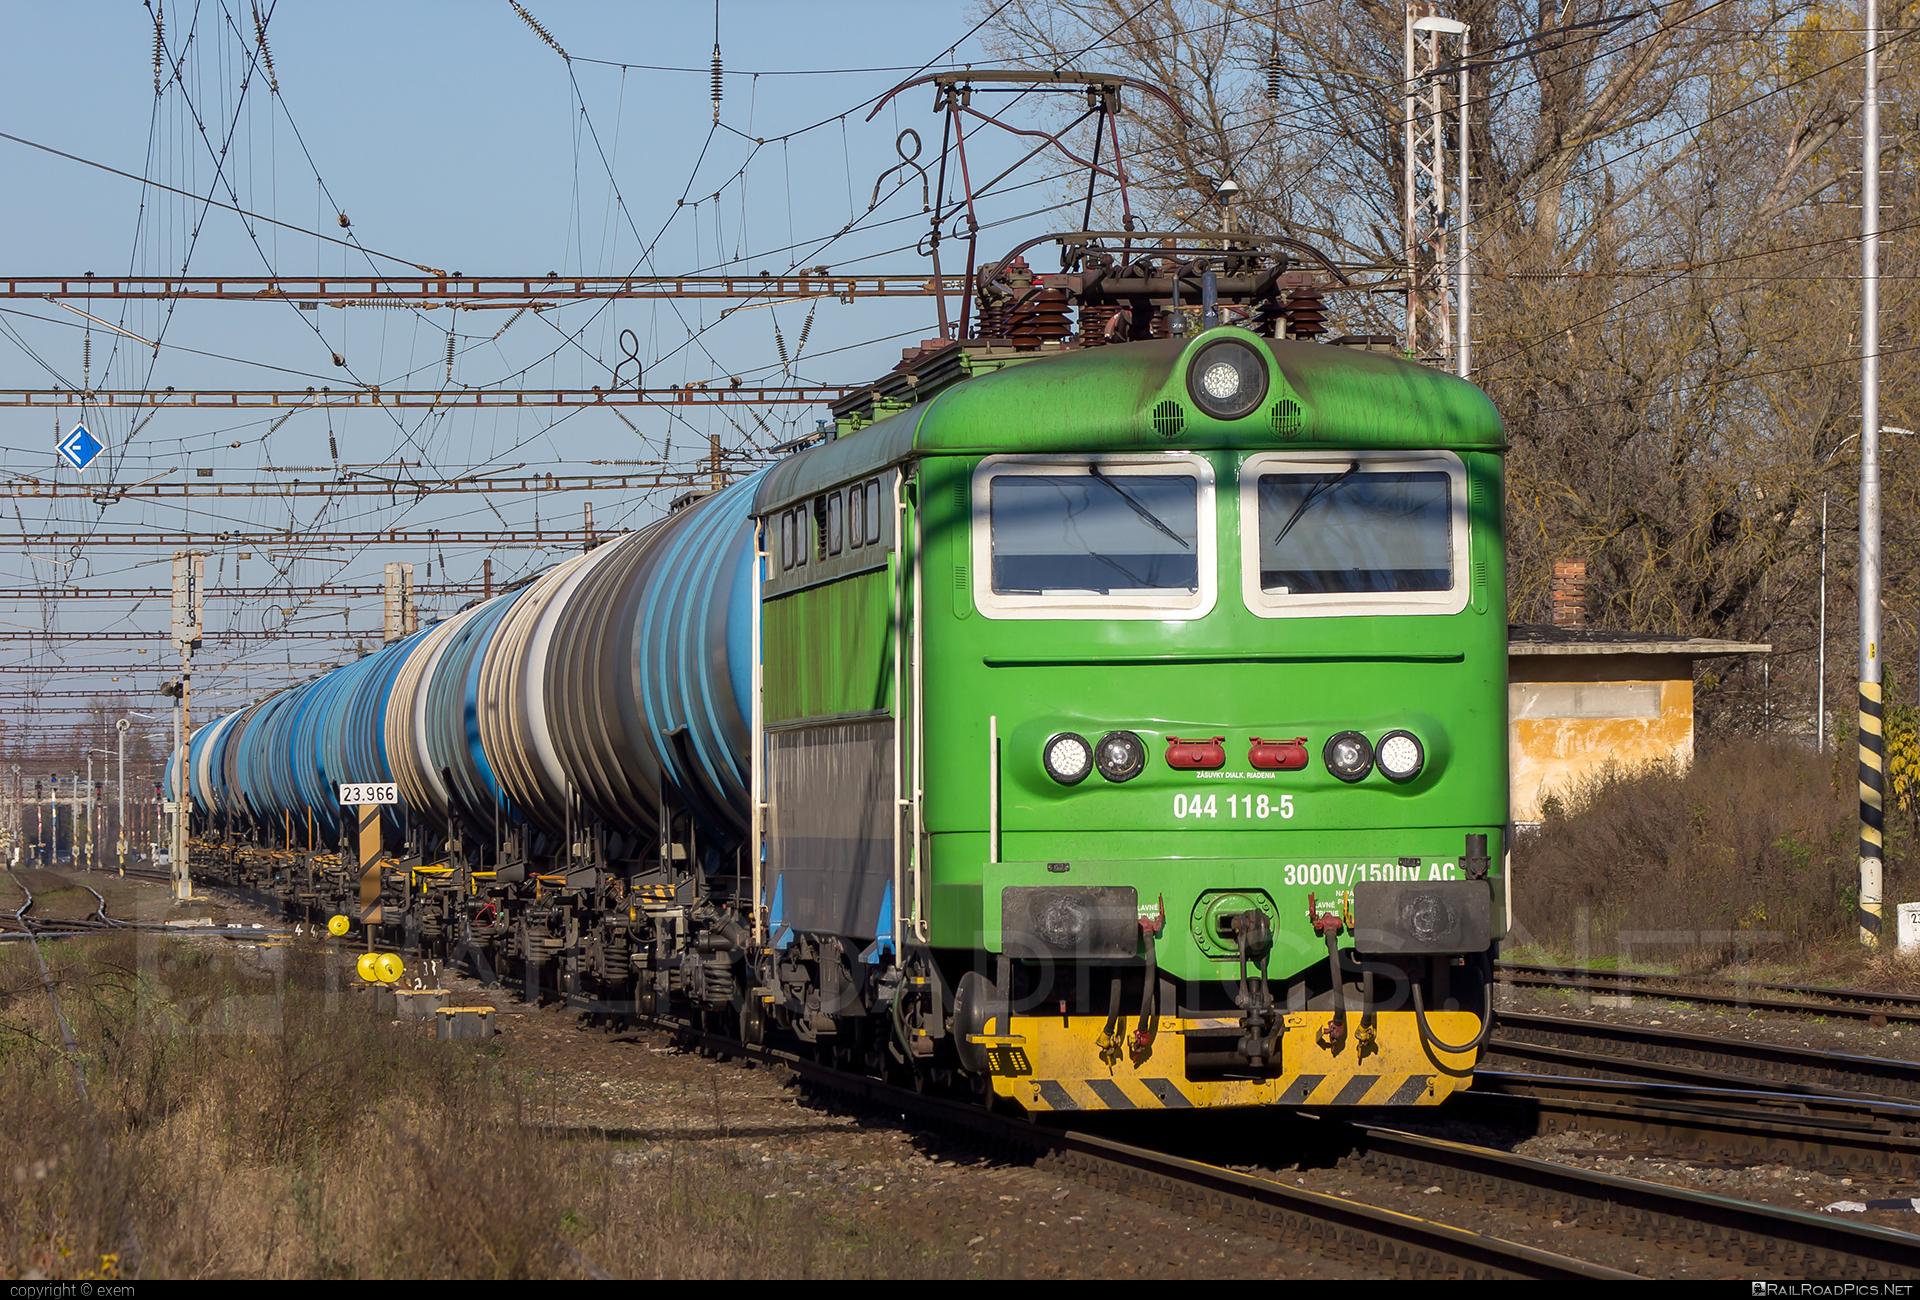 Škoda 73E - 044 118-5 operated by Railtrans International, s.r.o #RailtransInternational #kesselwagen #locomotive242 #plechac #railtrans #rti #skoda #skoda73e #tankwagon